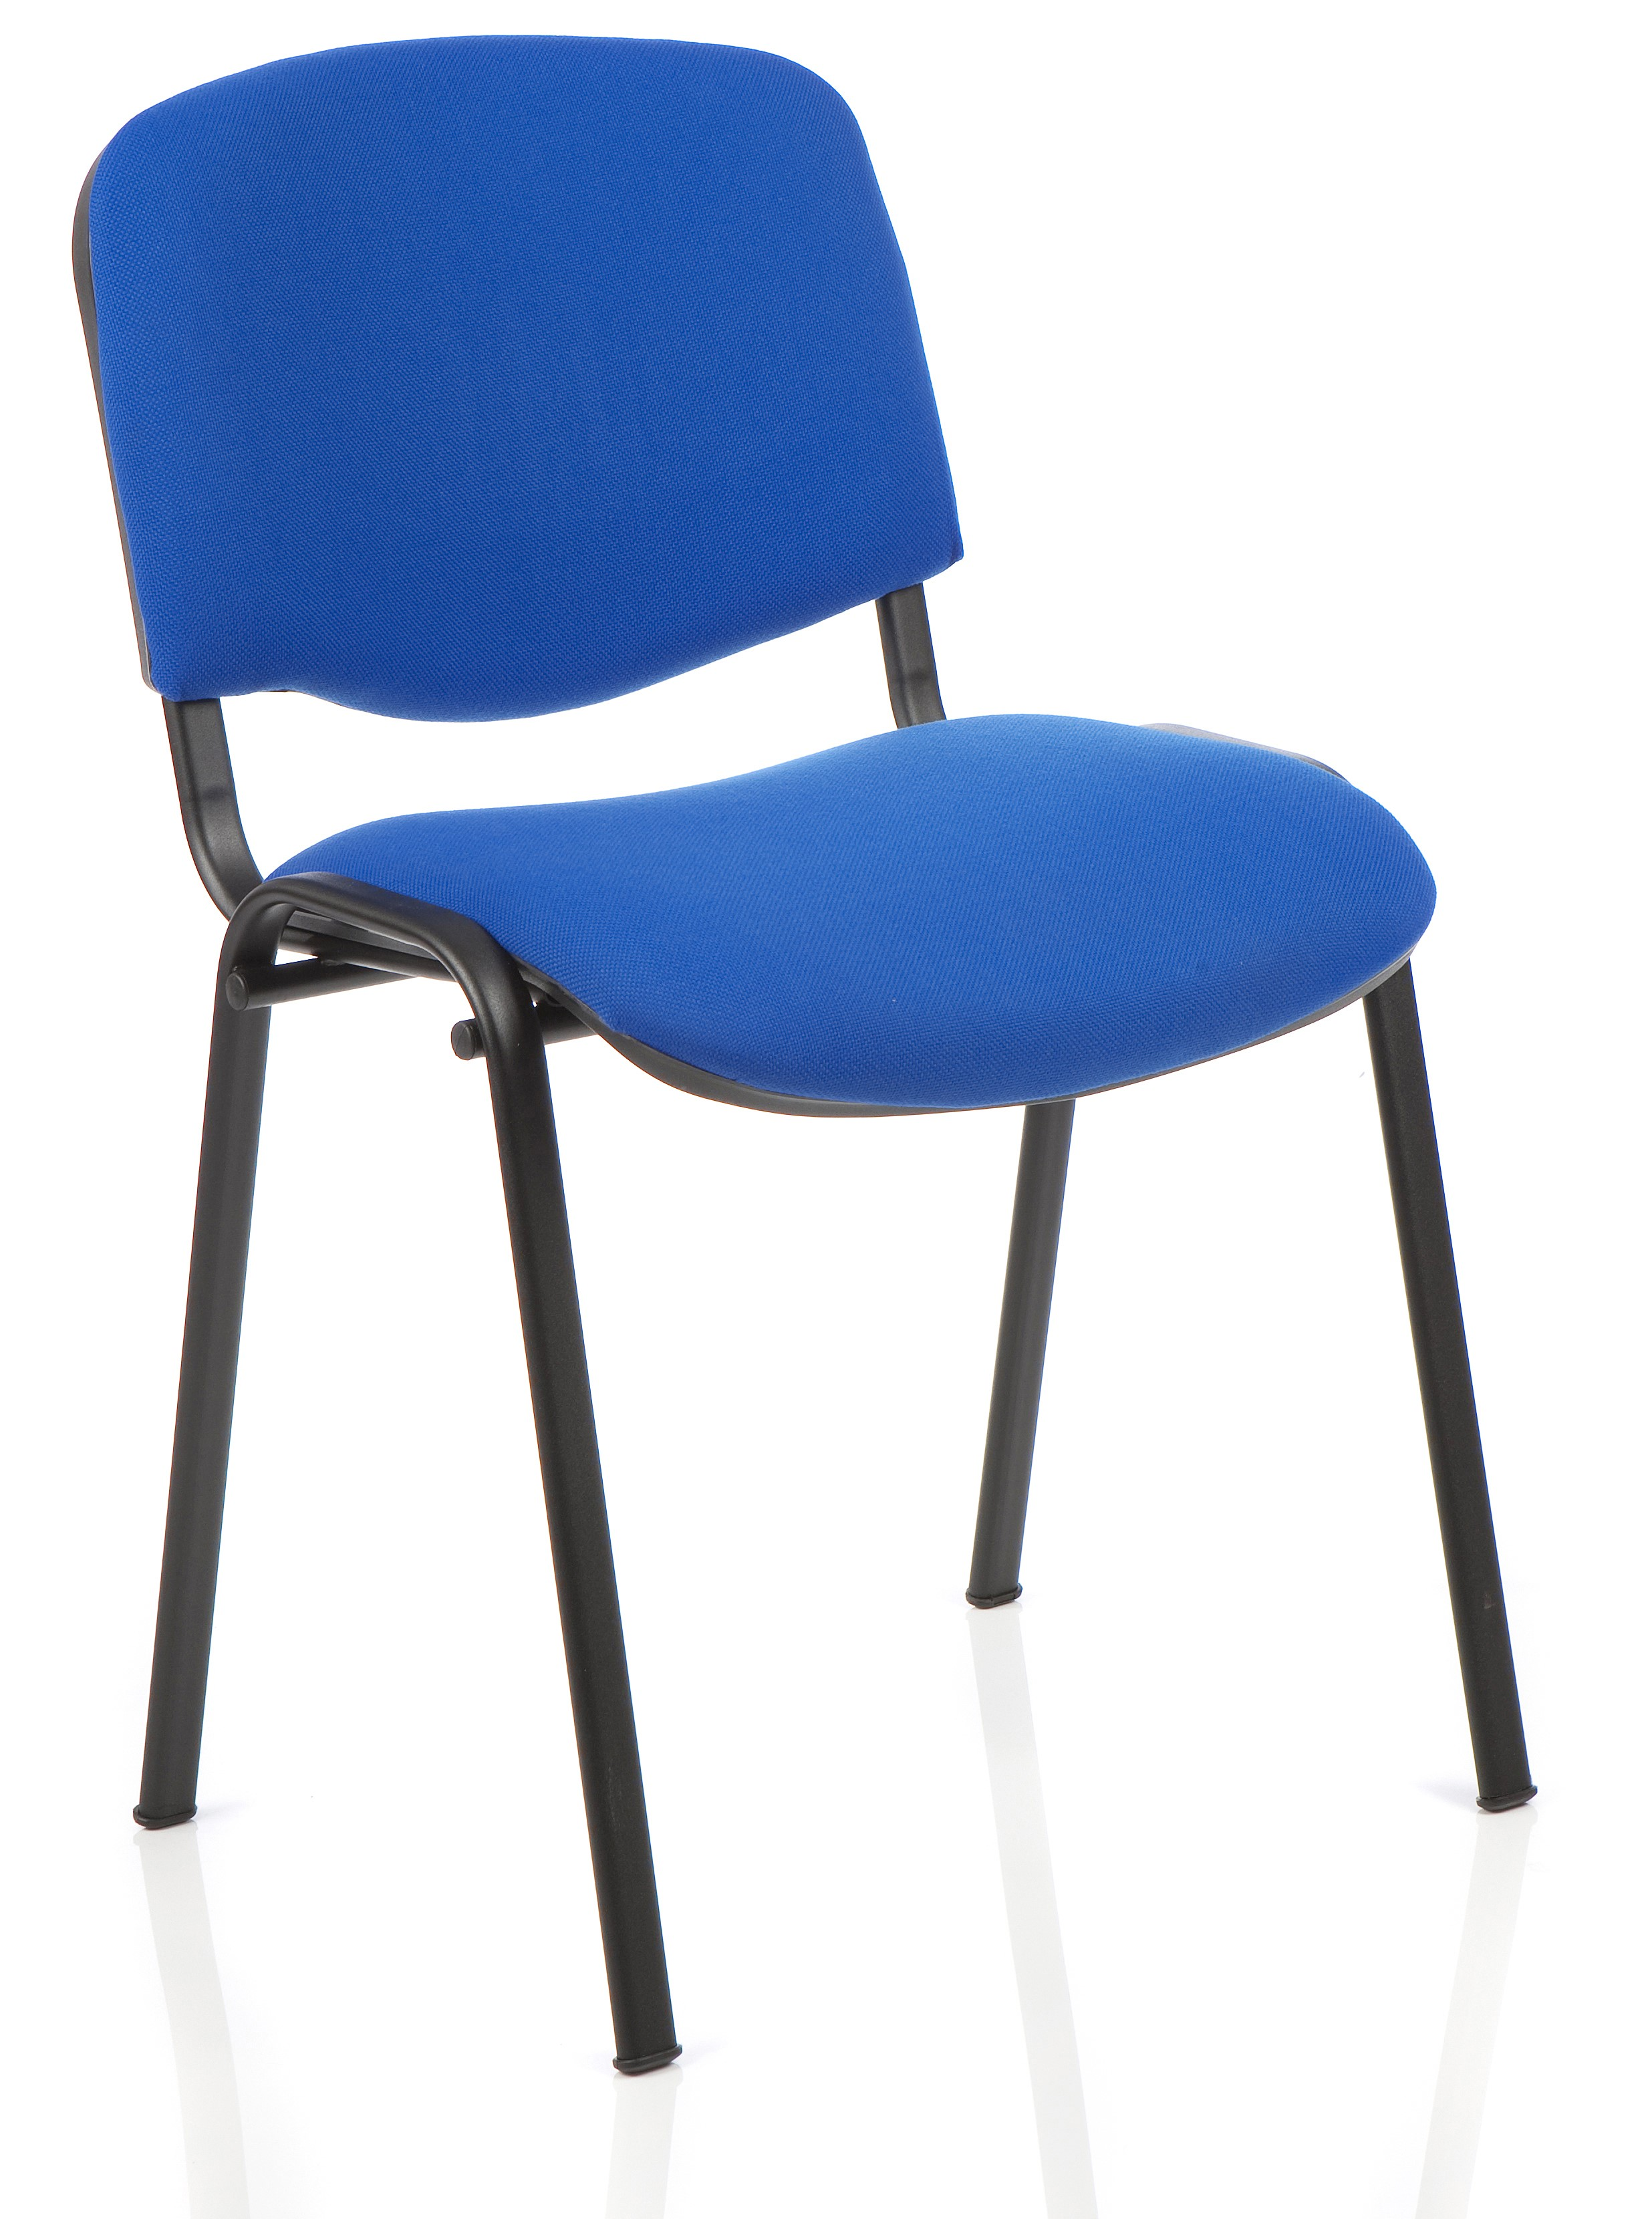 blue chair chairs model YORMFLB